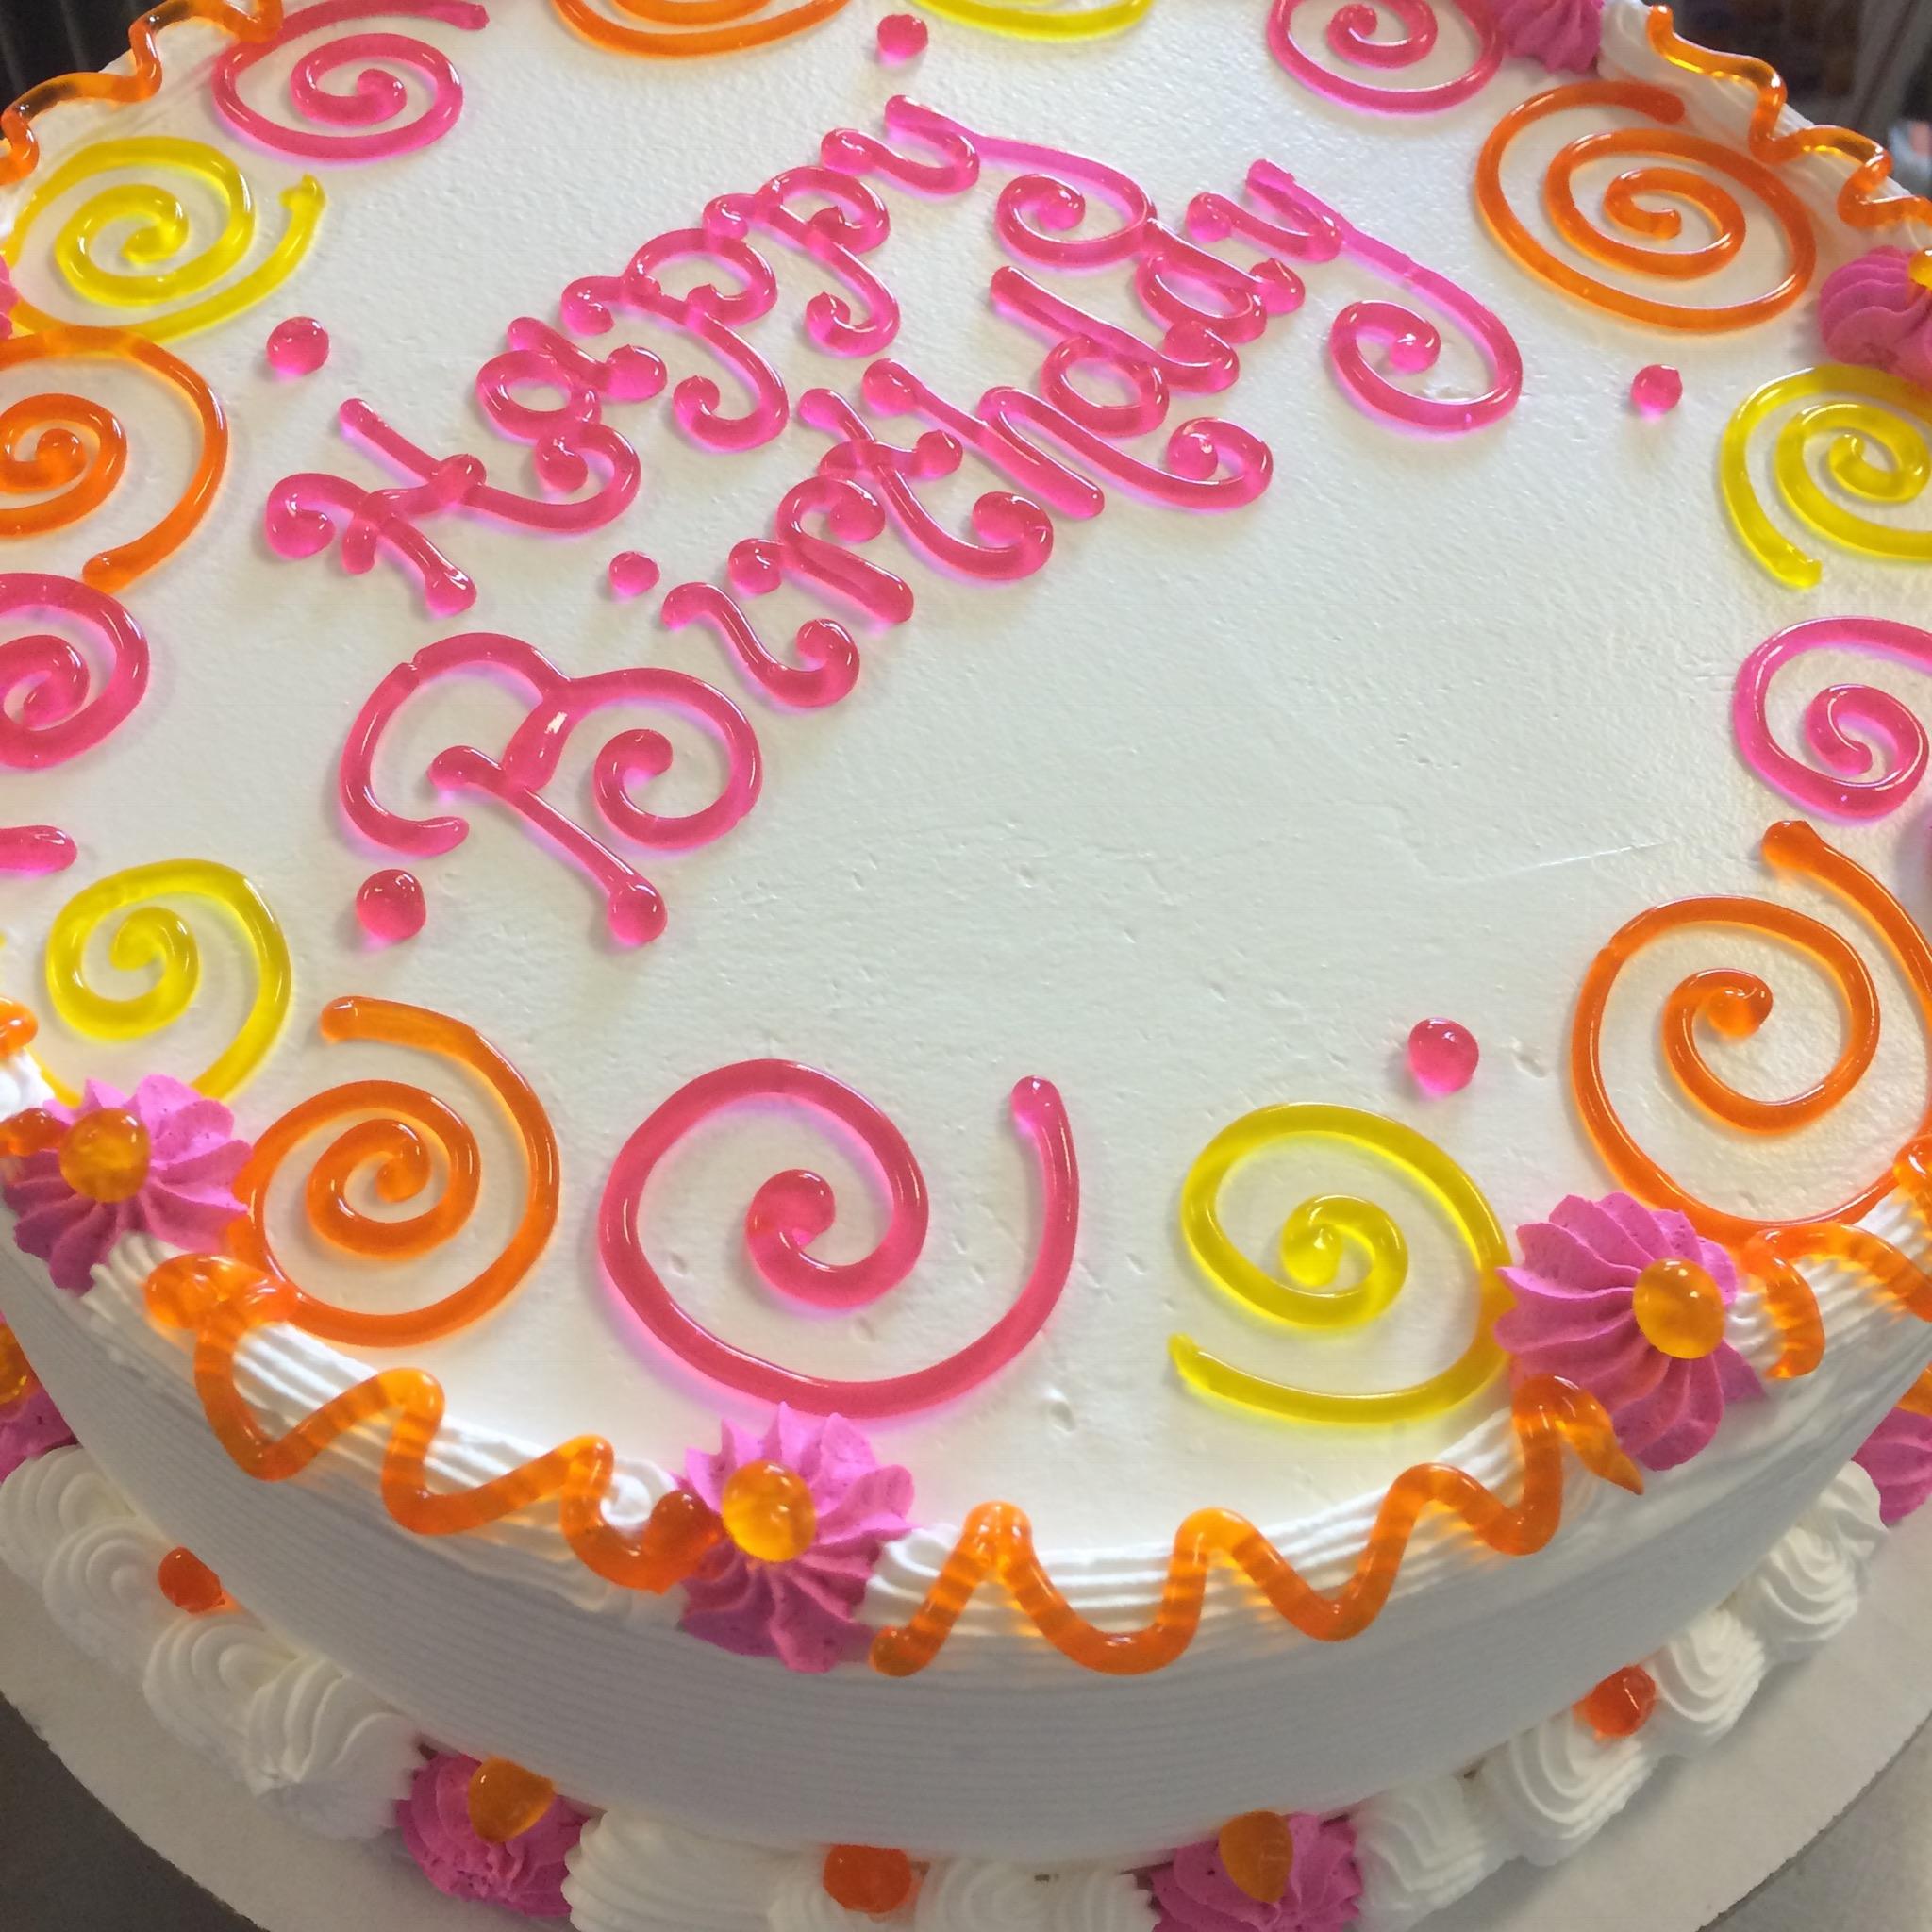 Cake Design #21